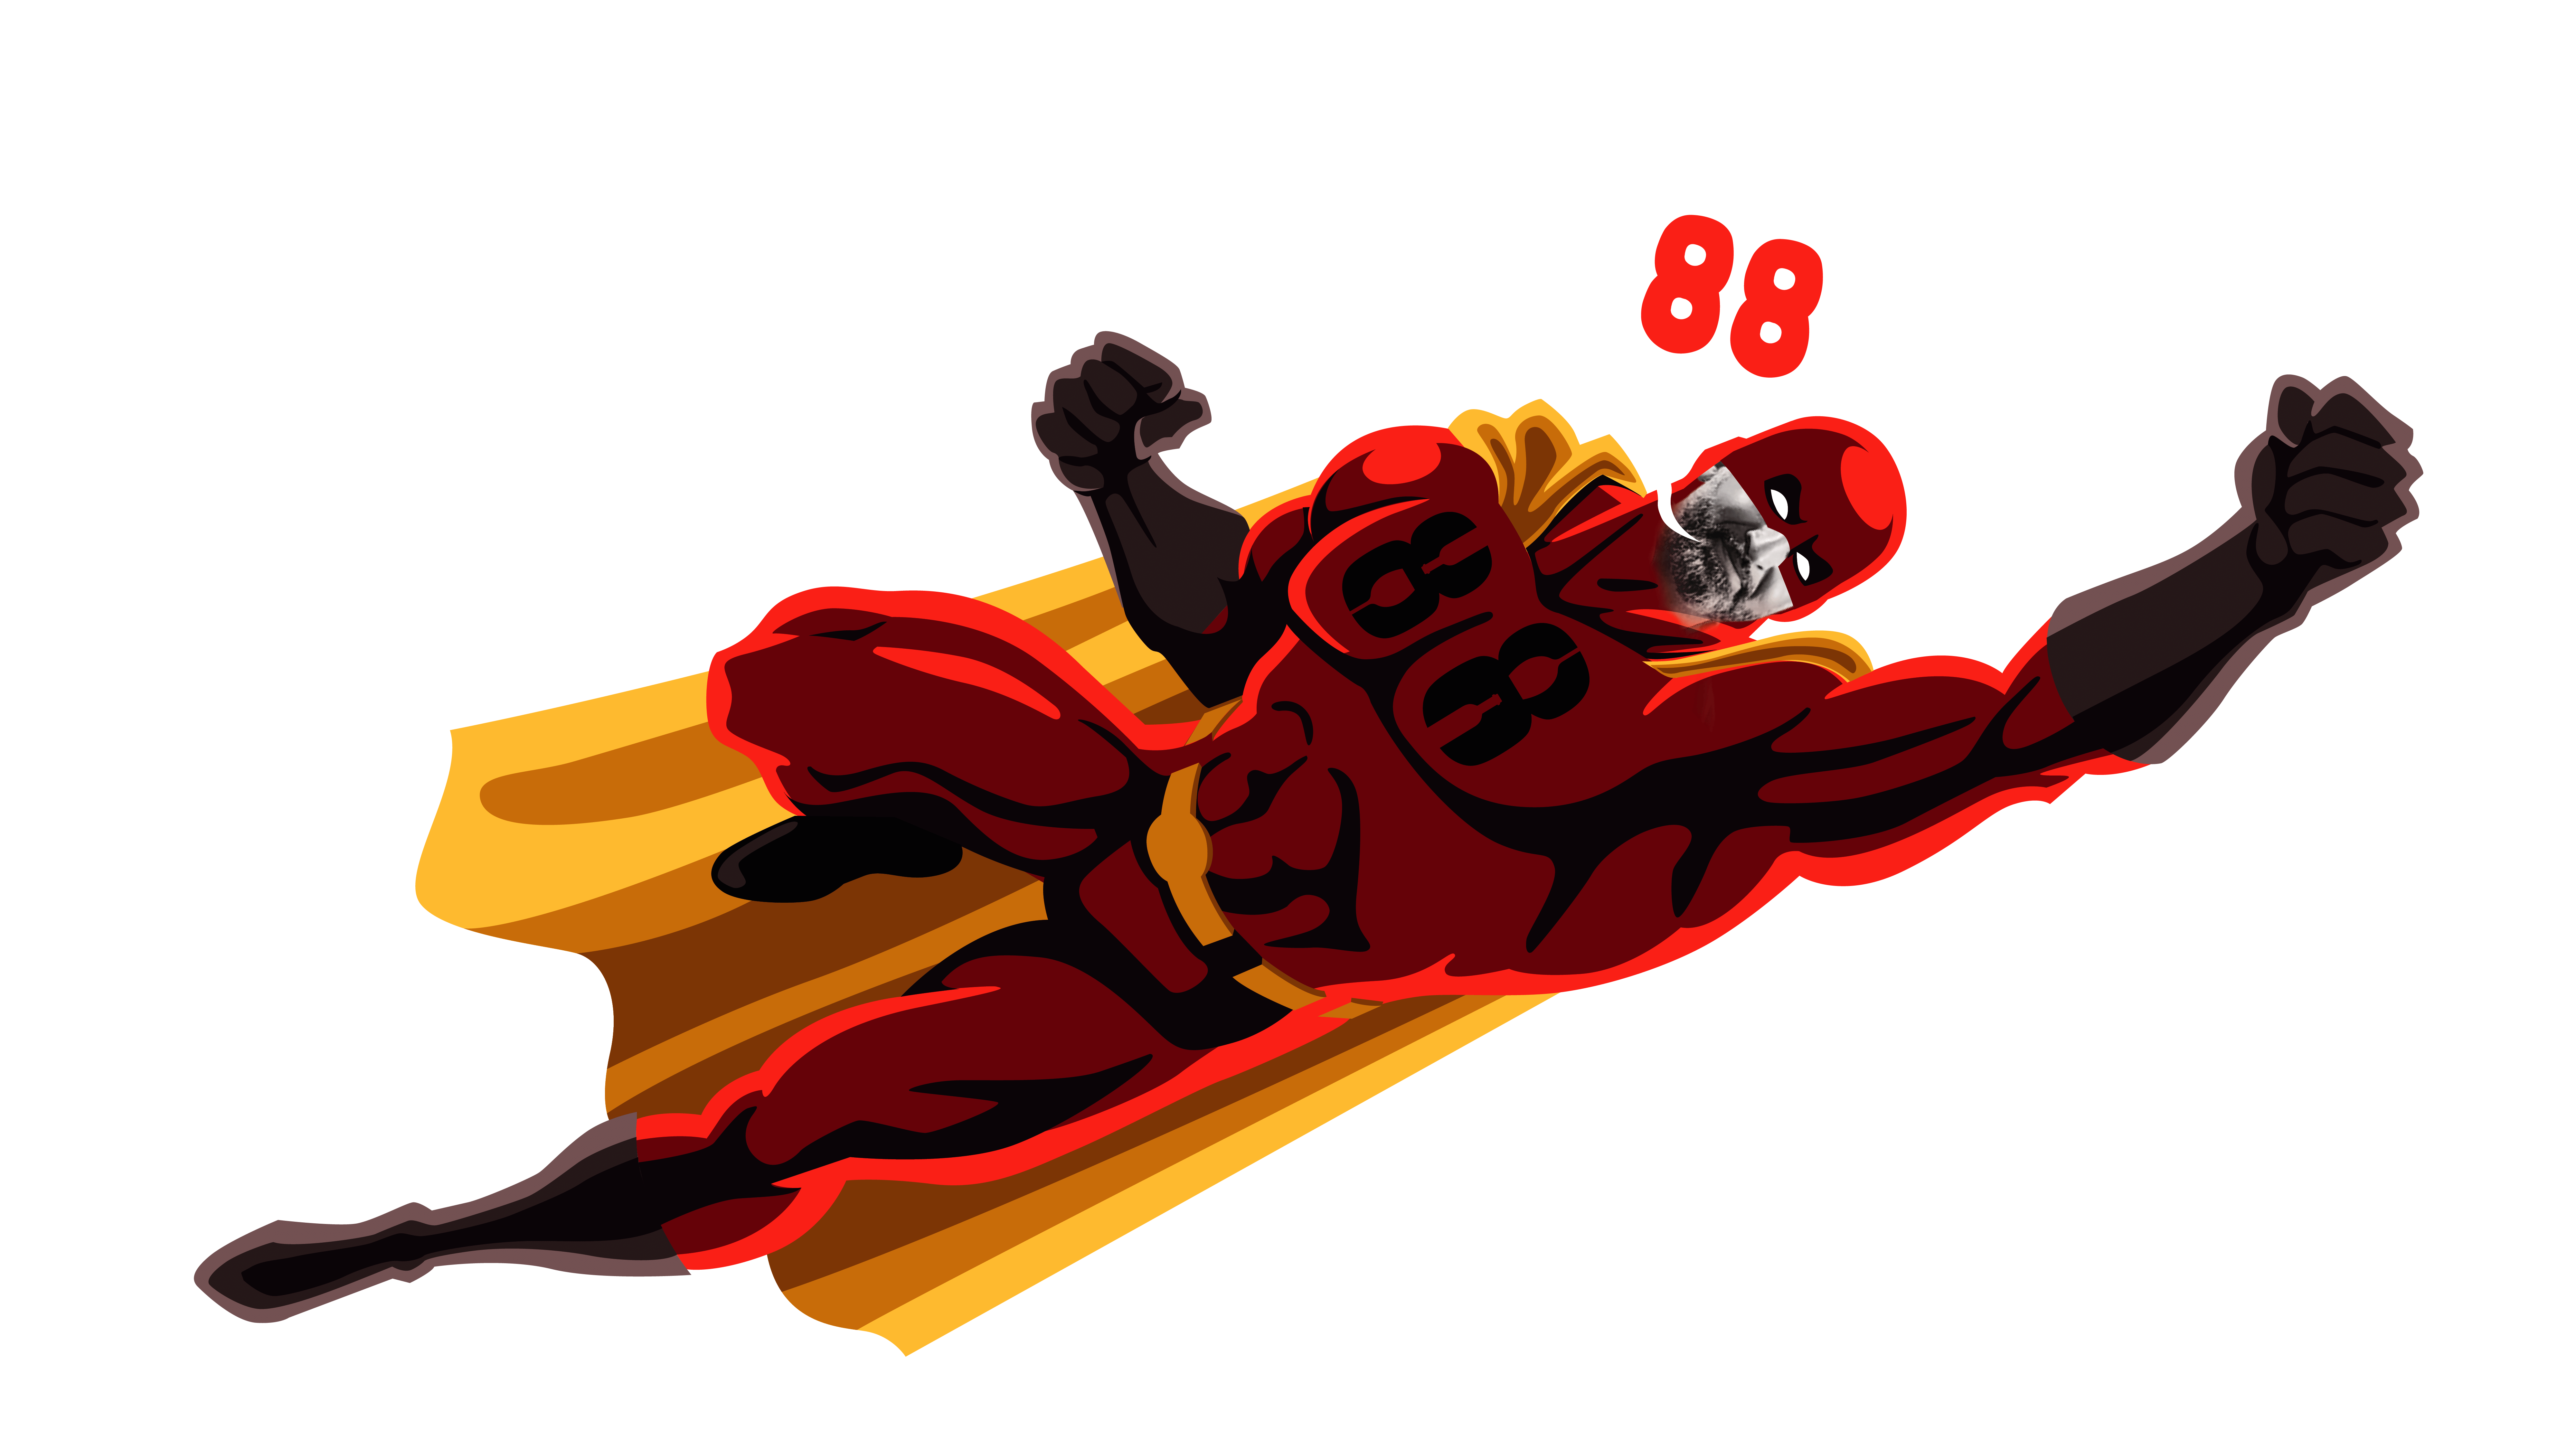 illustration supermomo le 88 header